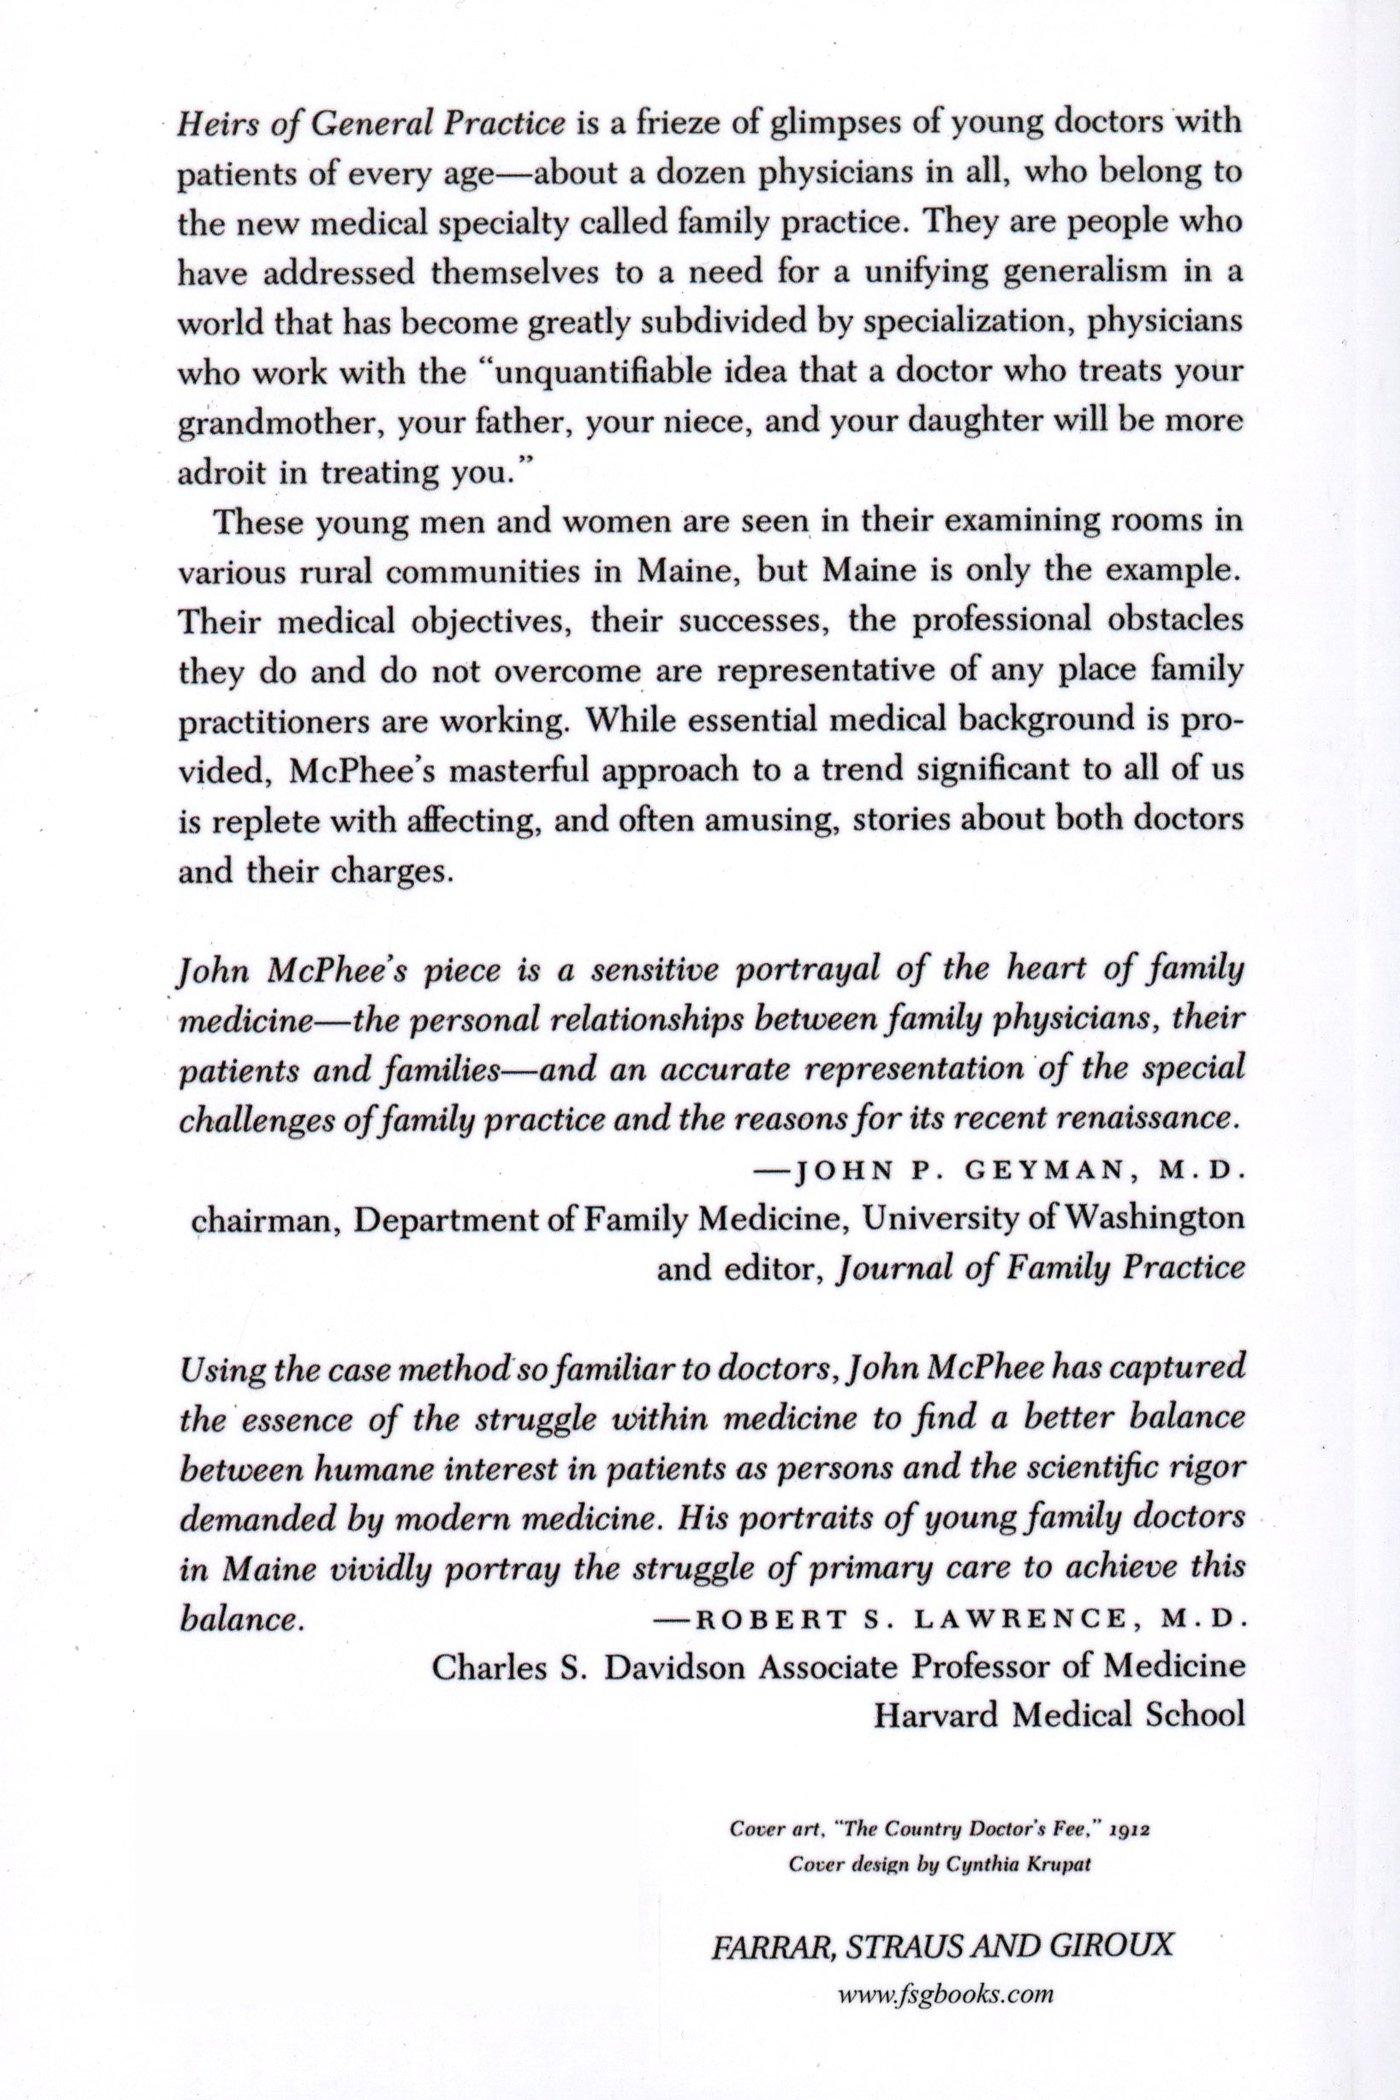 heirs of general practice john mcphee com heirs of general practice john mcphee 9780374519742 com books